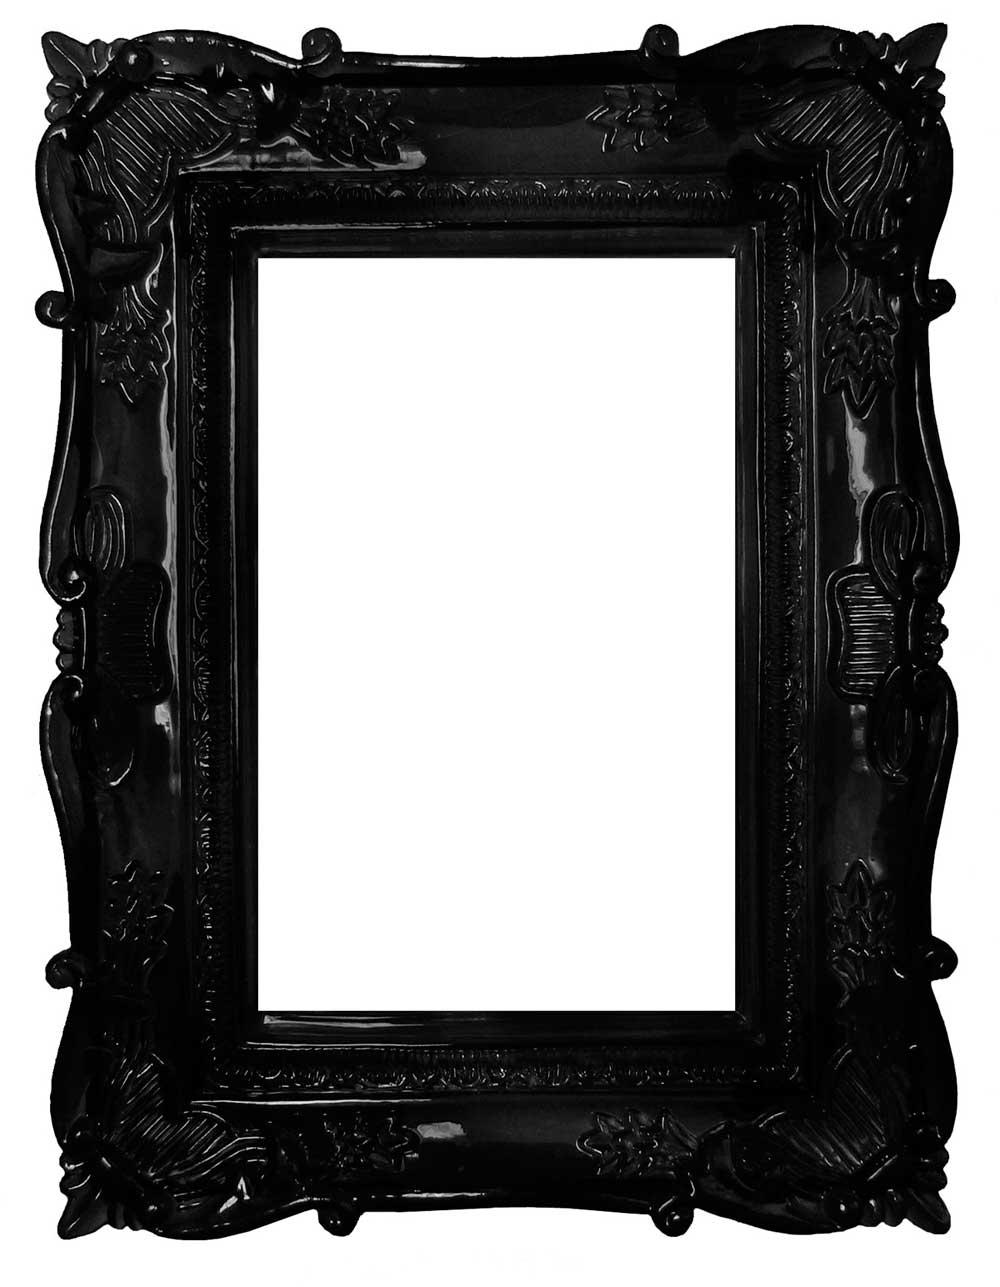 Black poster frames 19 x 27